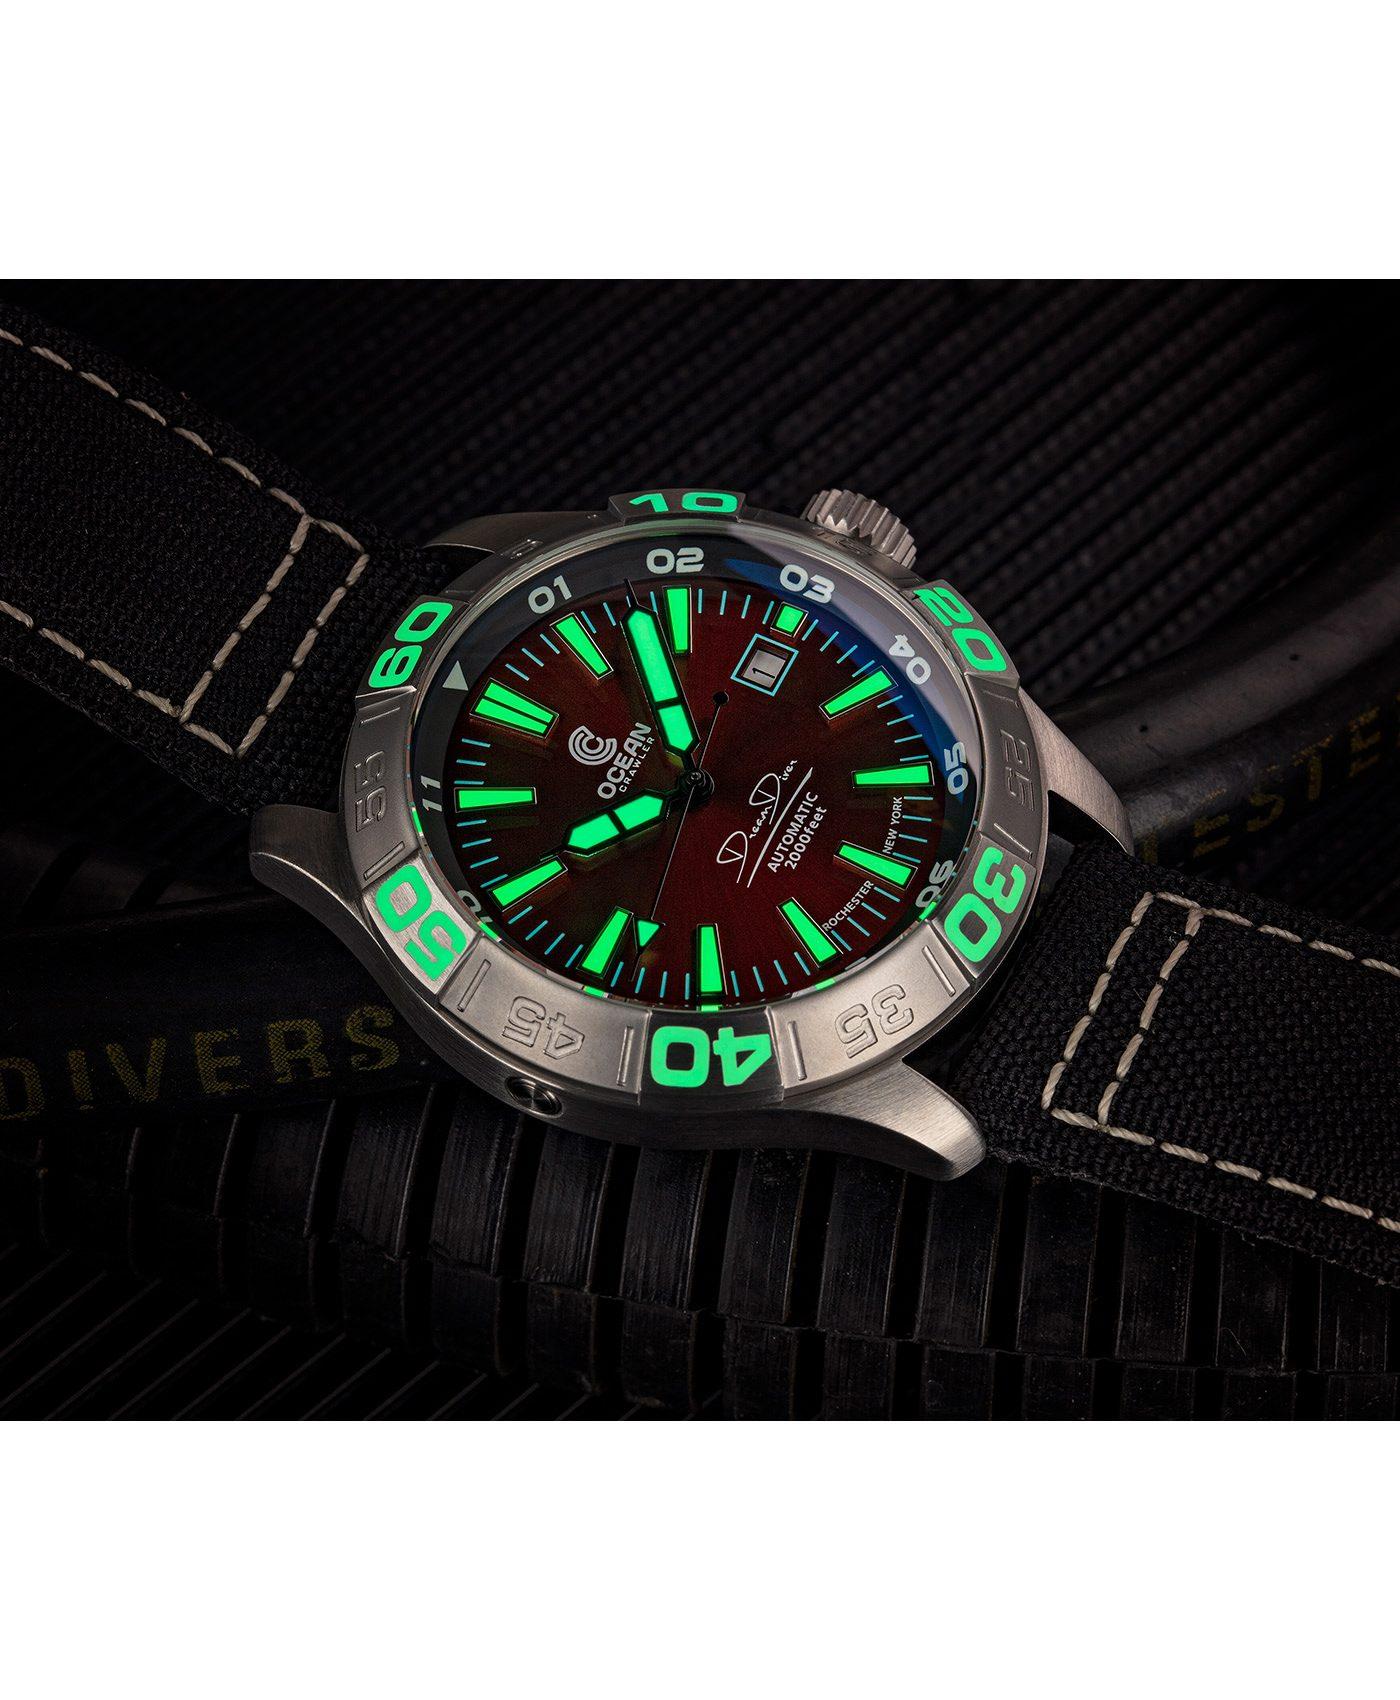 WB Ocean Crawler Dream Diver Dream Diver Red Dial lume